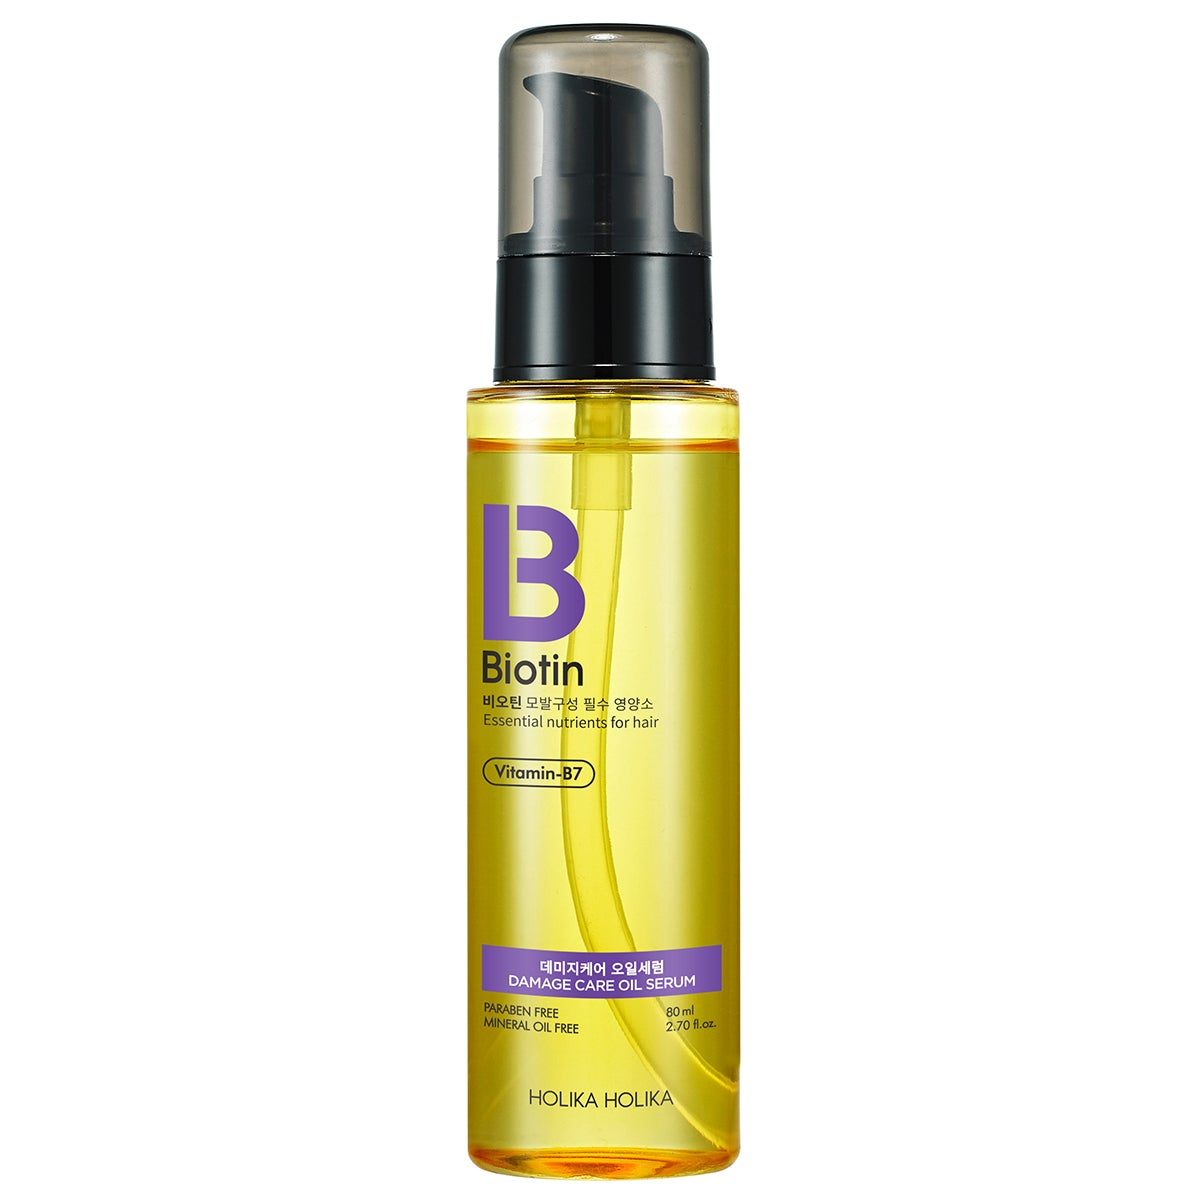 Köp Biotin Damage Care Oil Serum,  Holika Holika Serum & hårolja fraktfritt